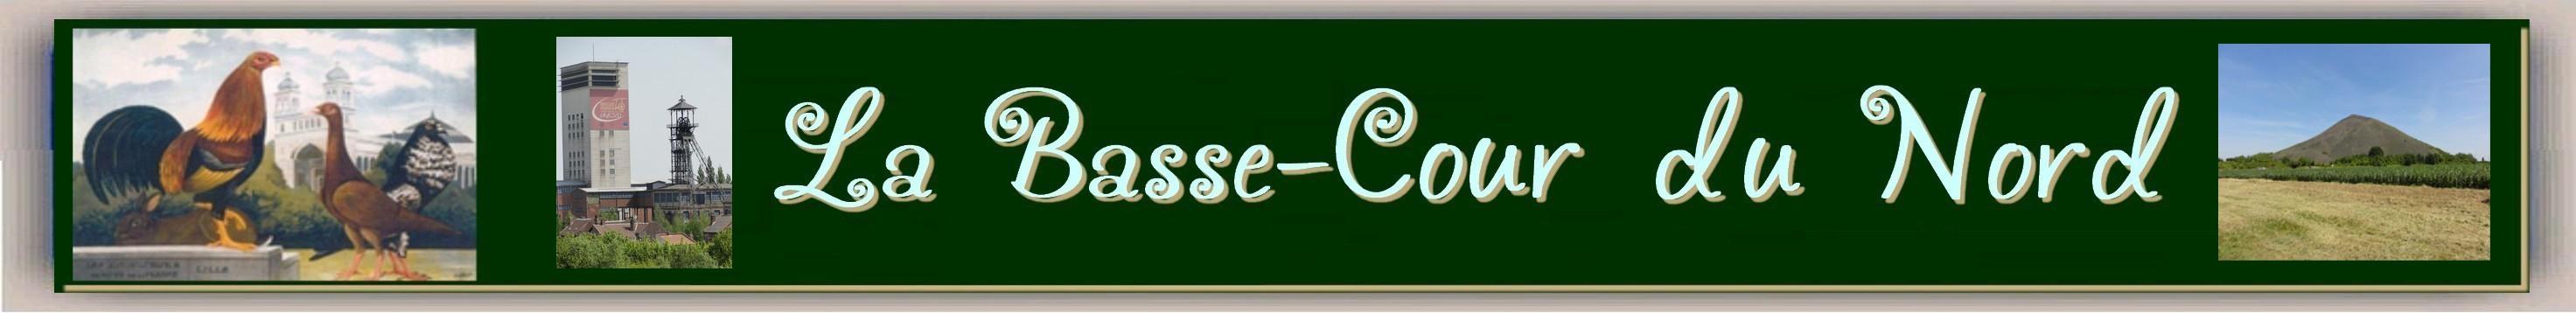 http://www.la-basse-cour-du-nord.fr/nouvo-title2.jpg